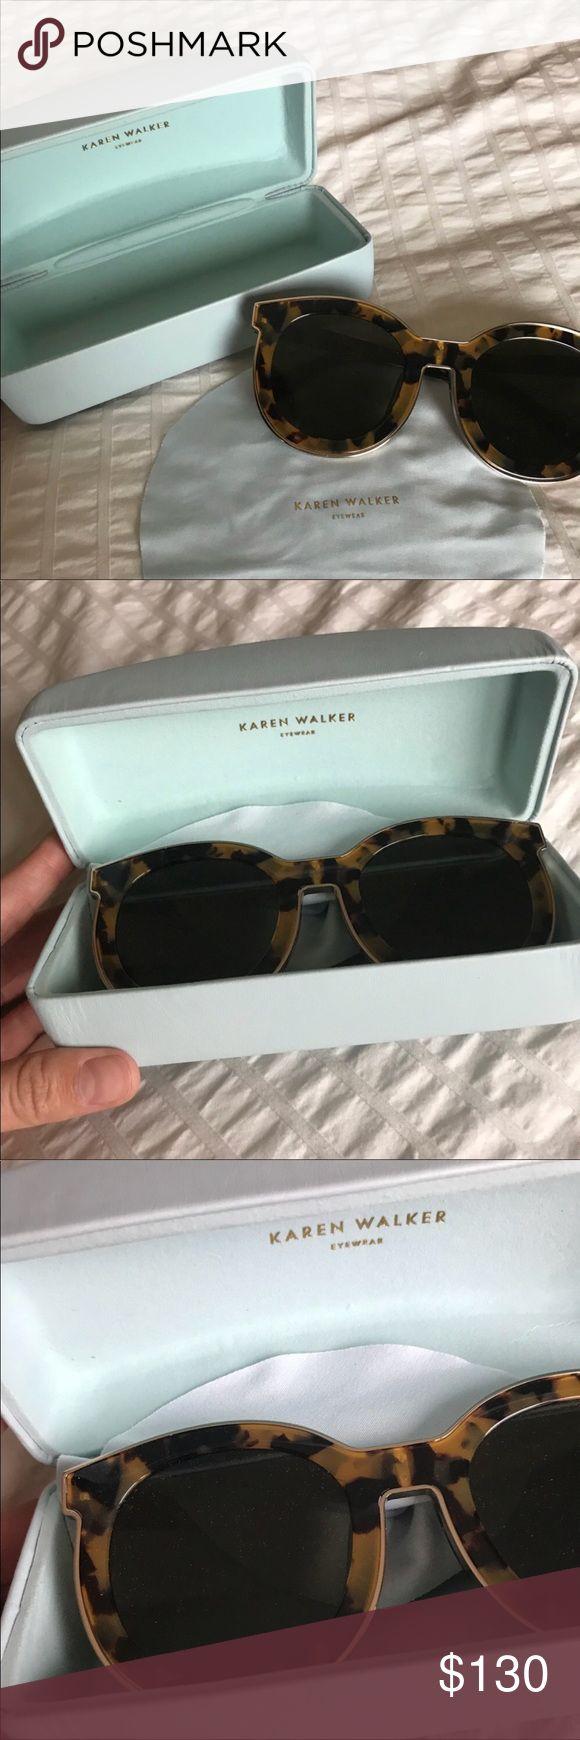 Karen Walker Super Spaceship Sunglasses Like new Karen Walker sunglasses. Worn once. Very chic sunglasses. Tortoise color. Karen Walker Accessories Sunglasses